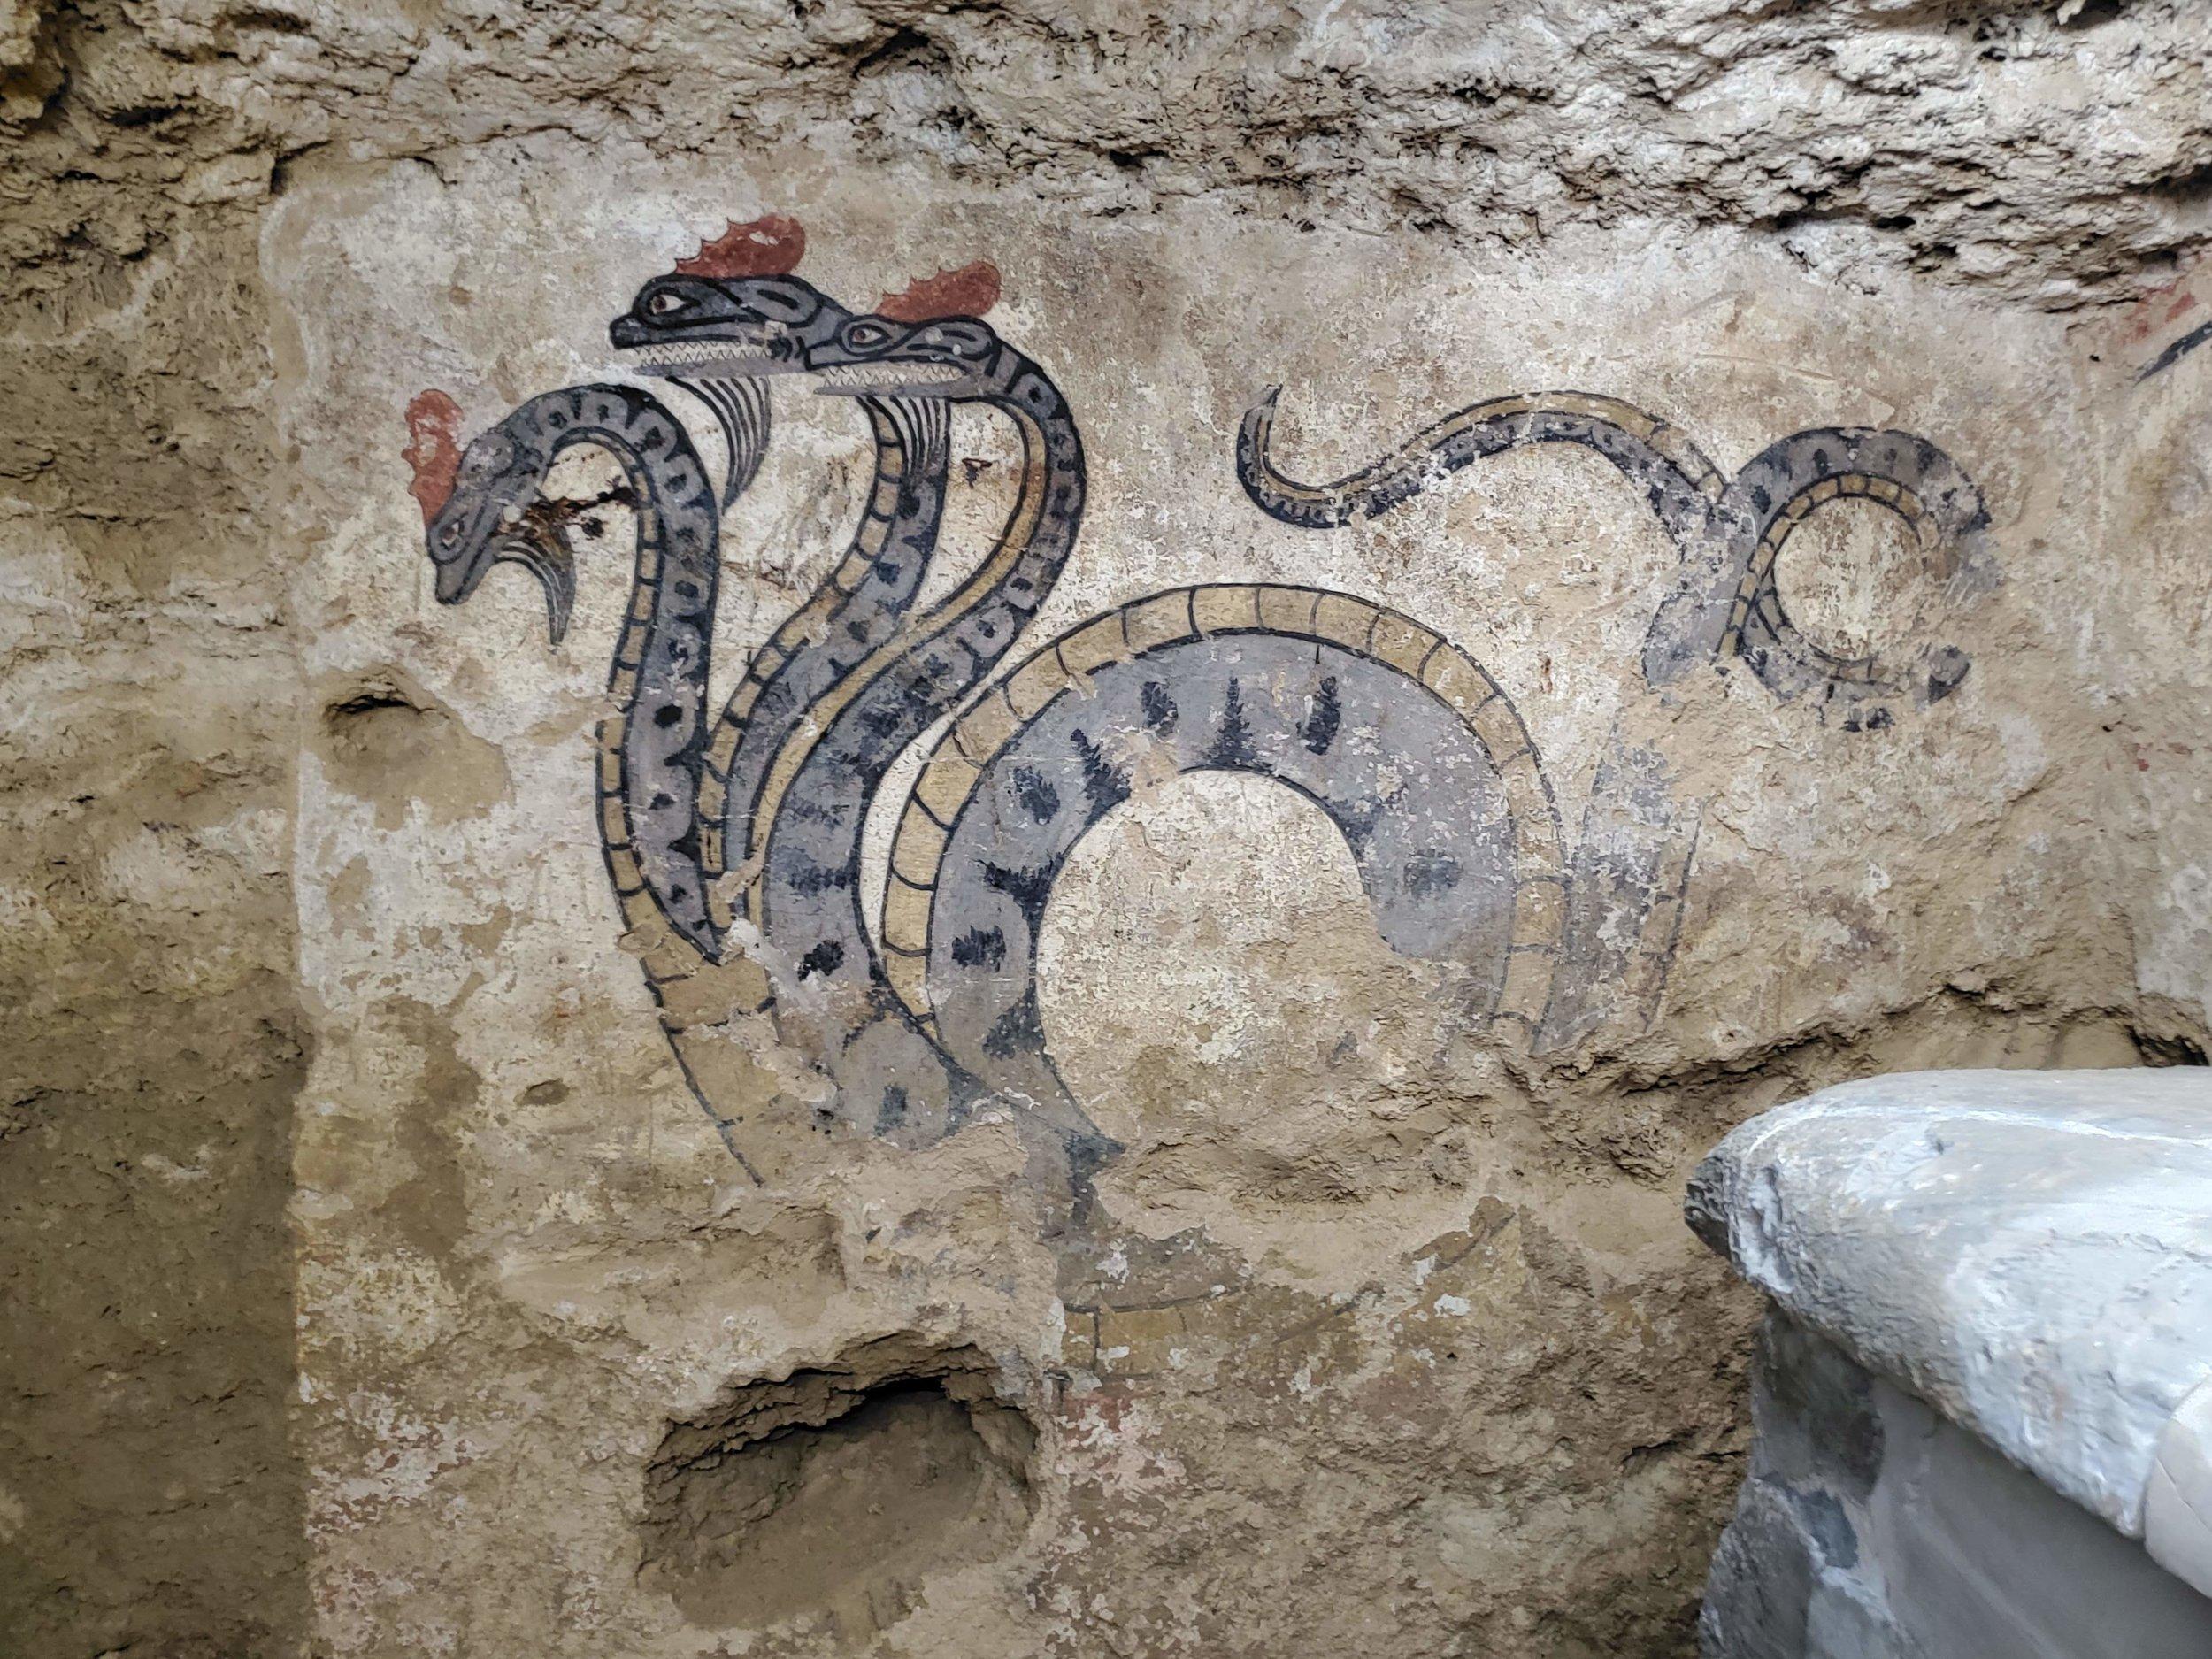 Snakes in underworld.jpg